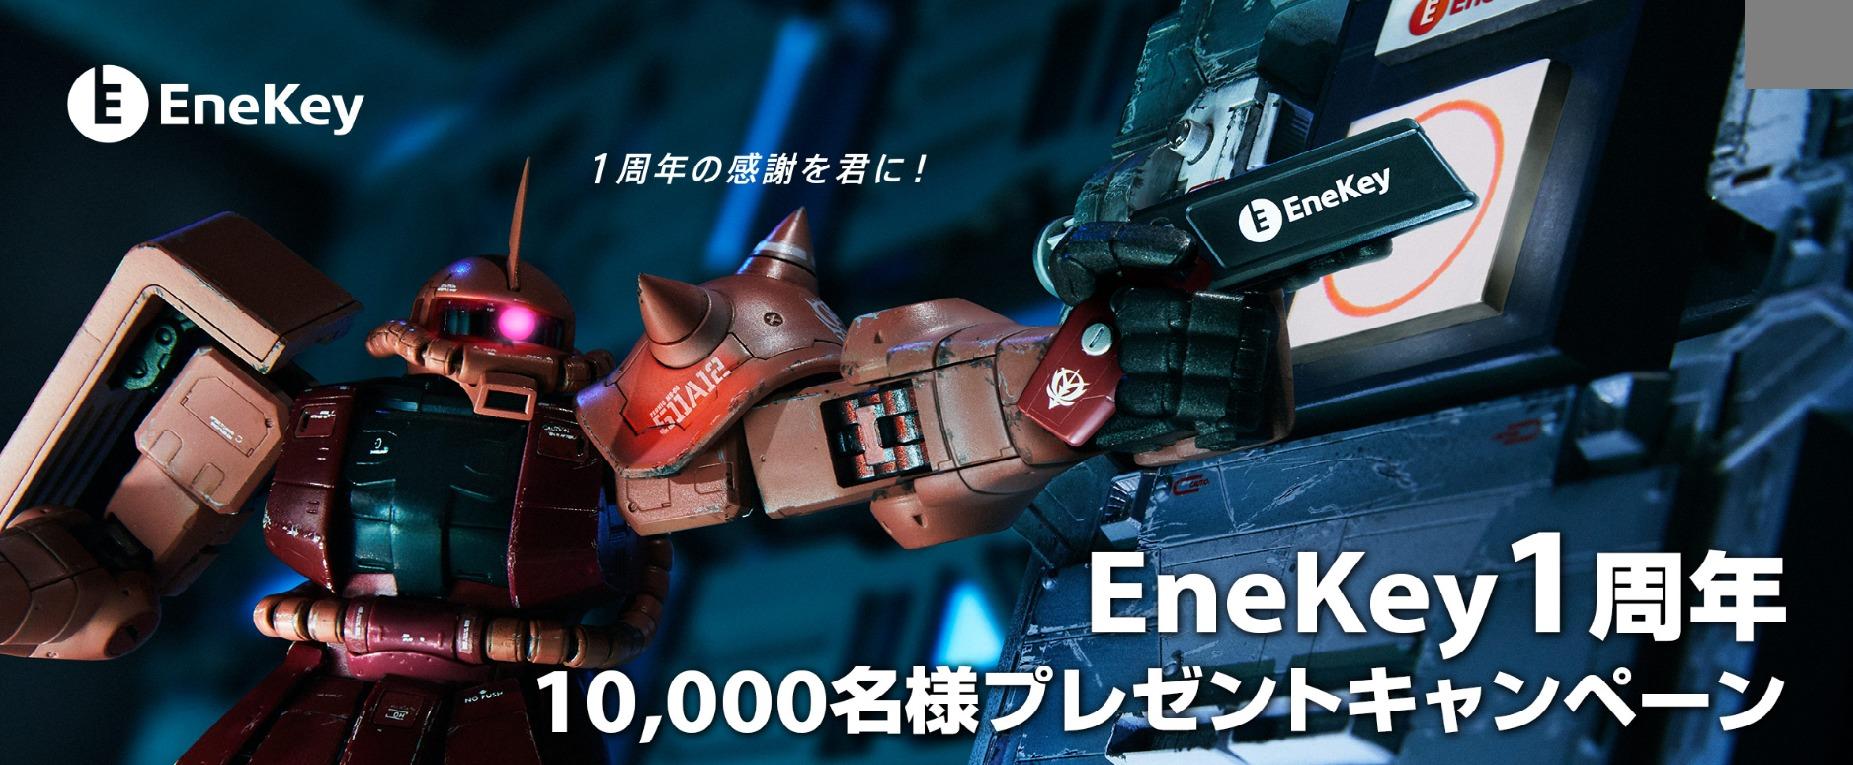 enekey-char